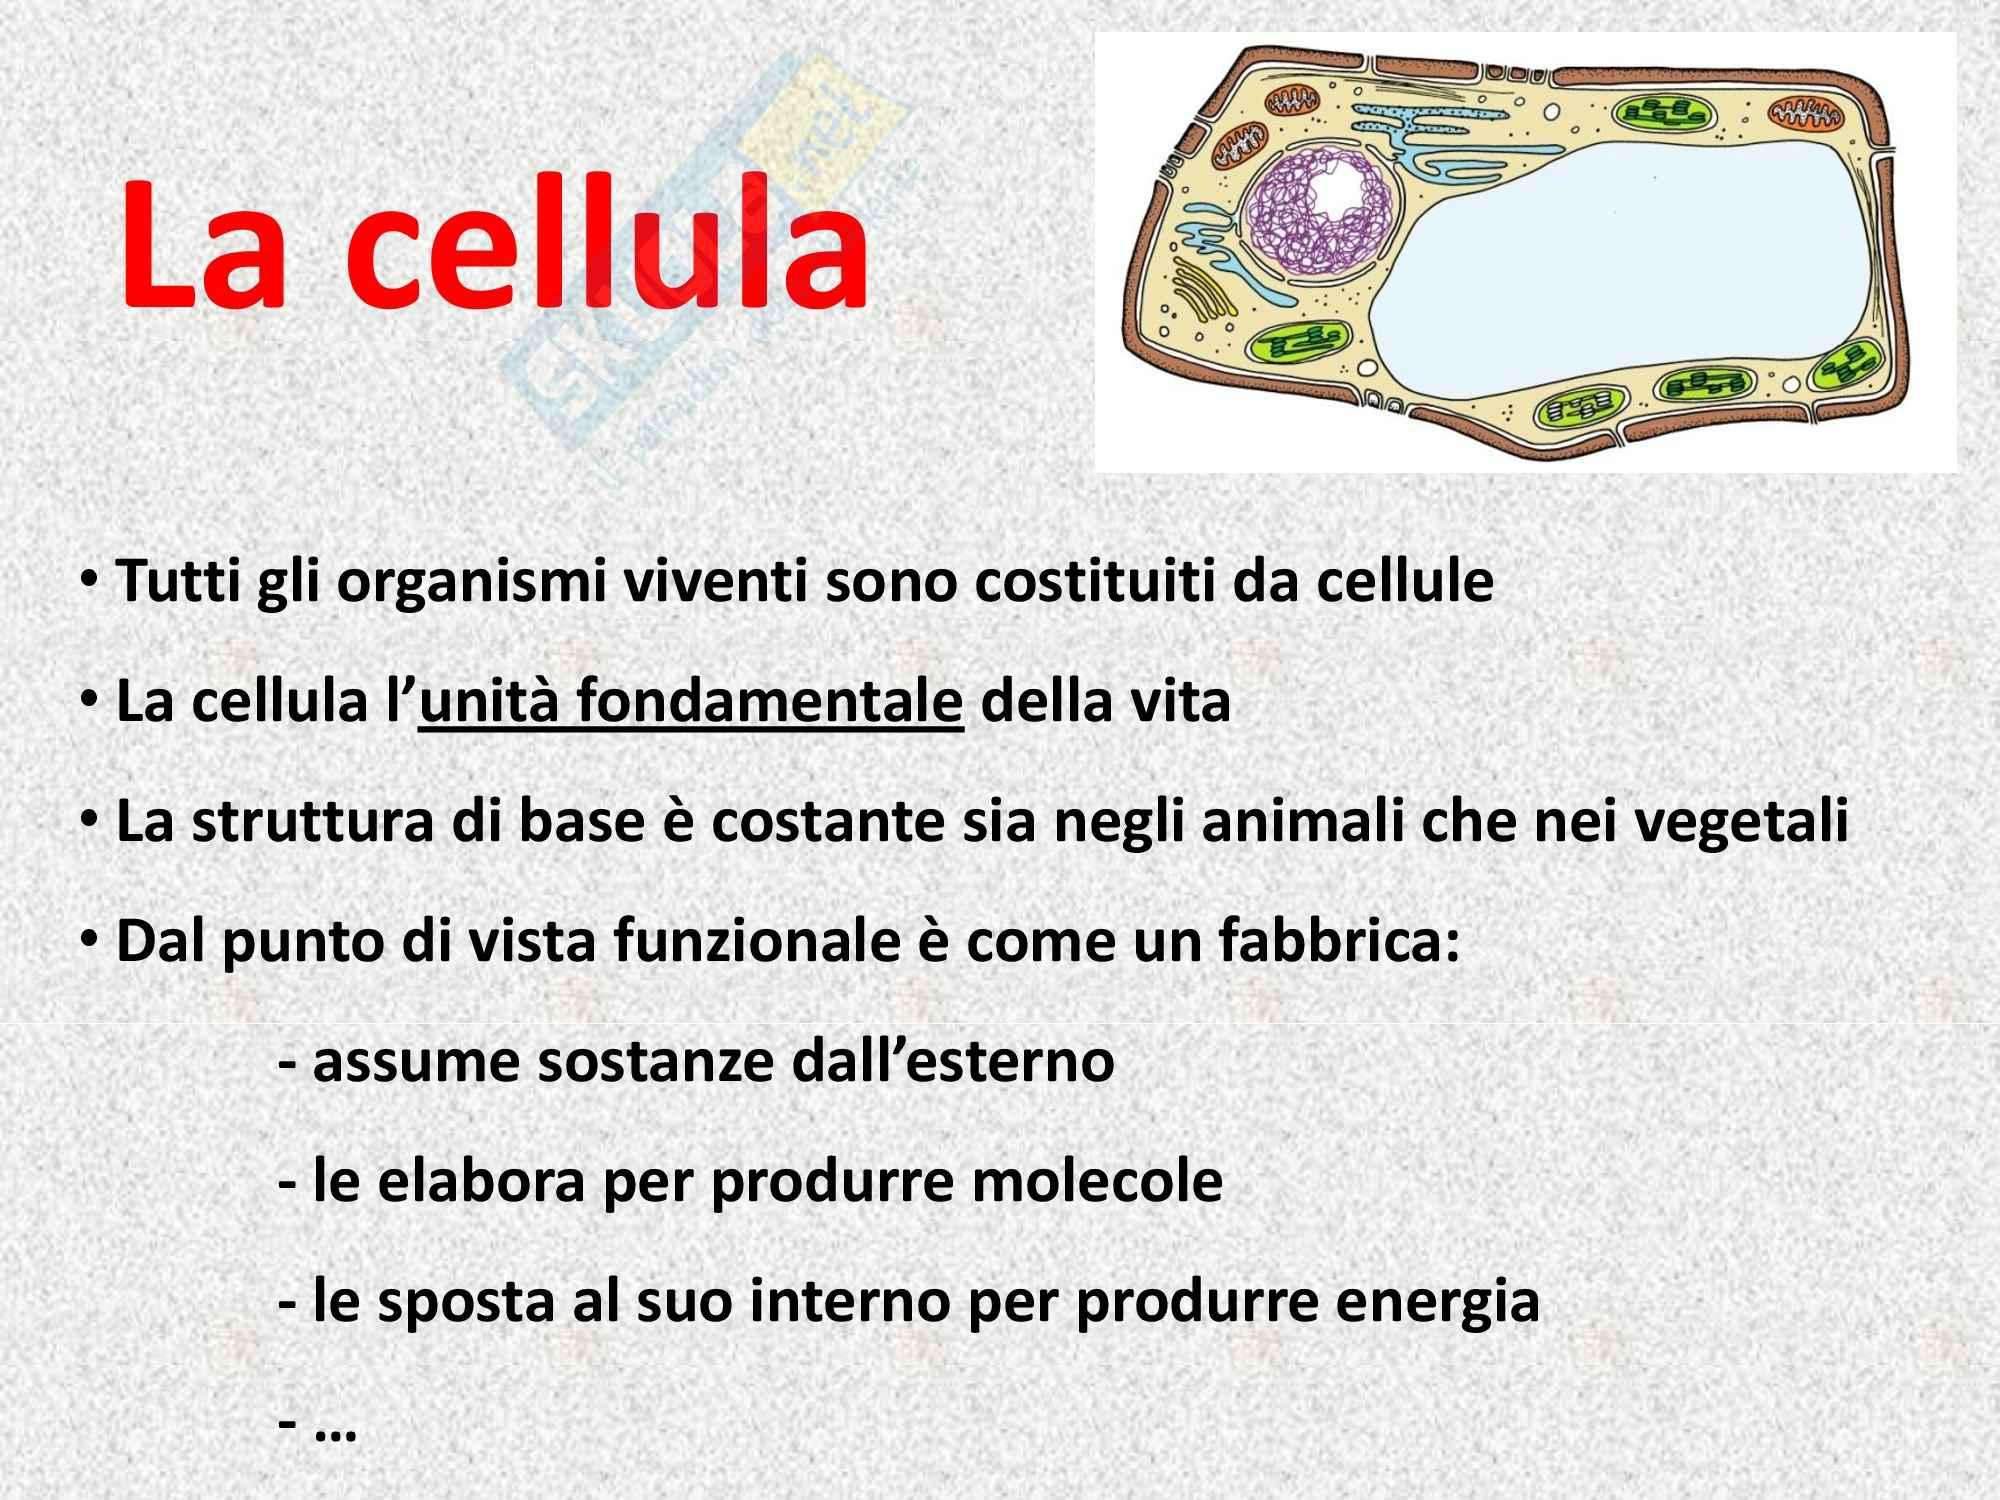 Biologia vegetale - la cellula vegetale Pag. 2